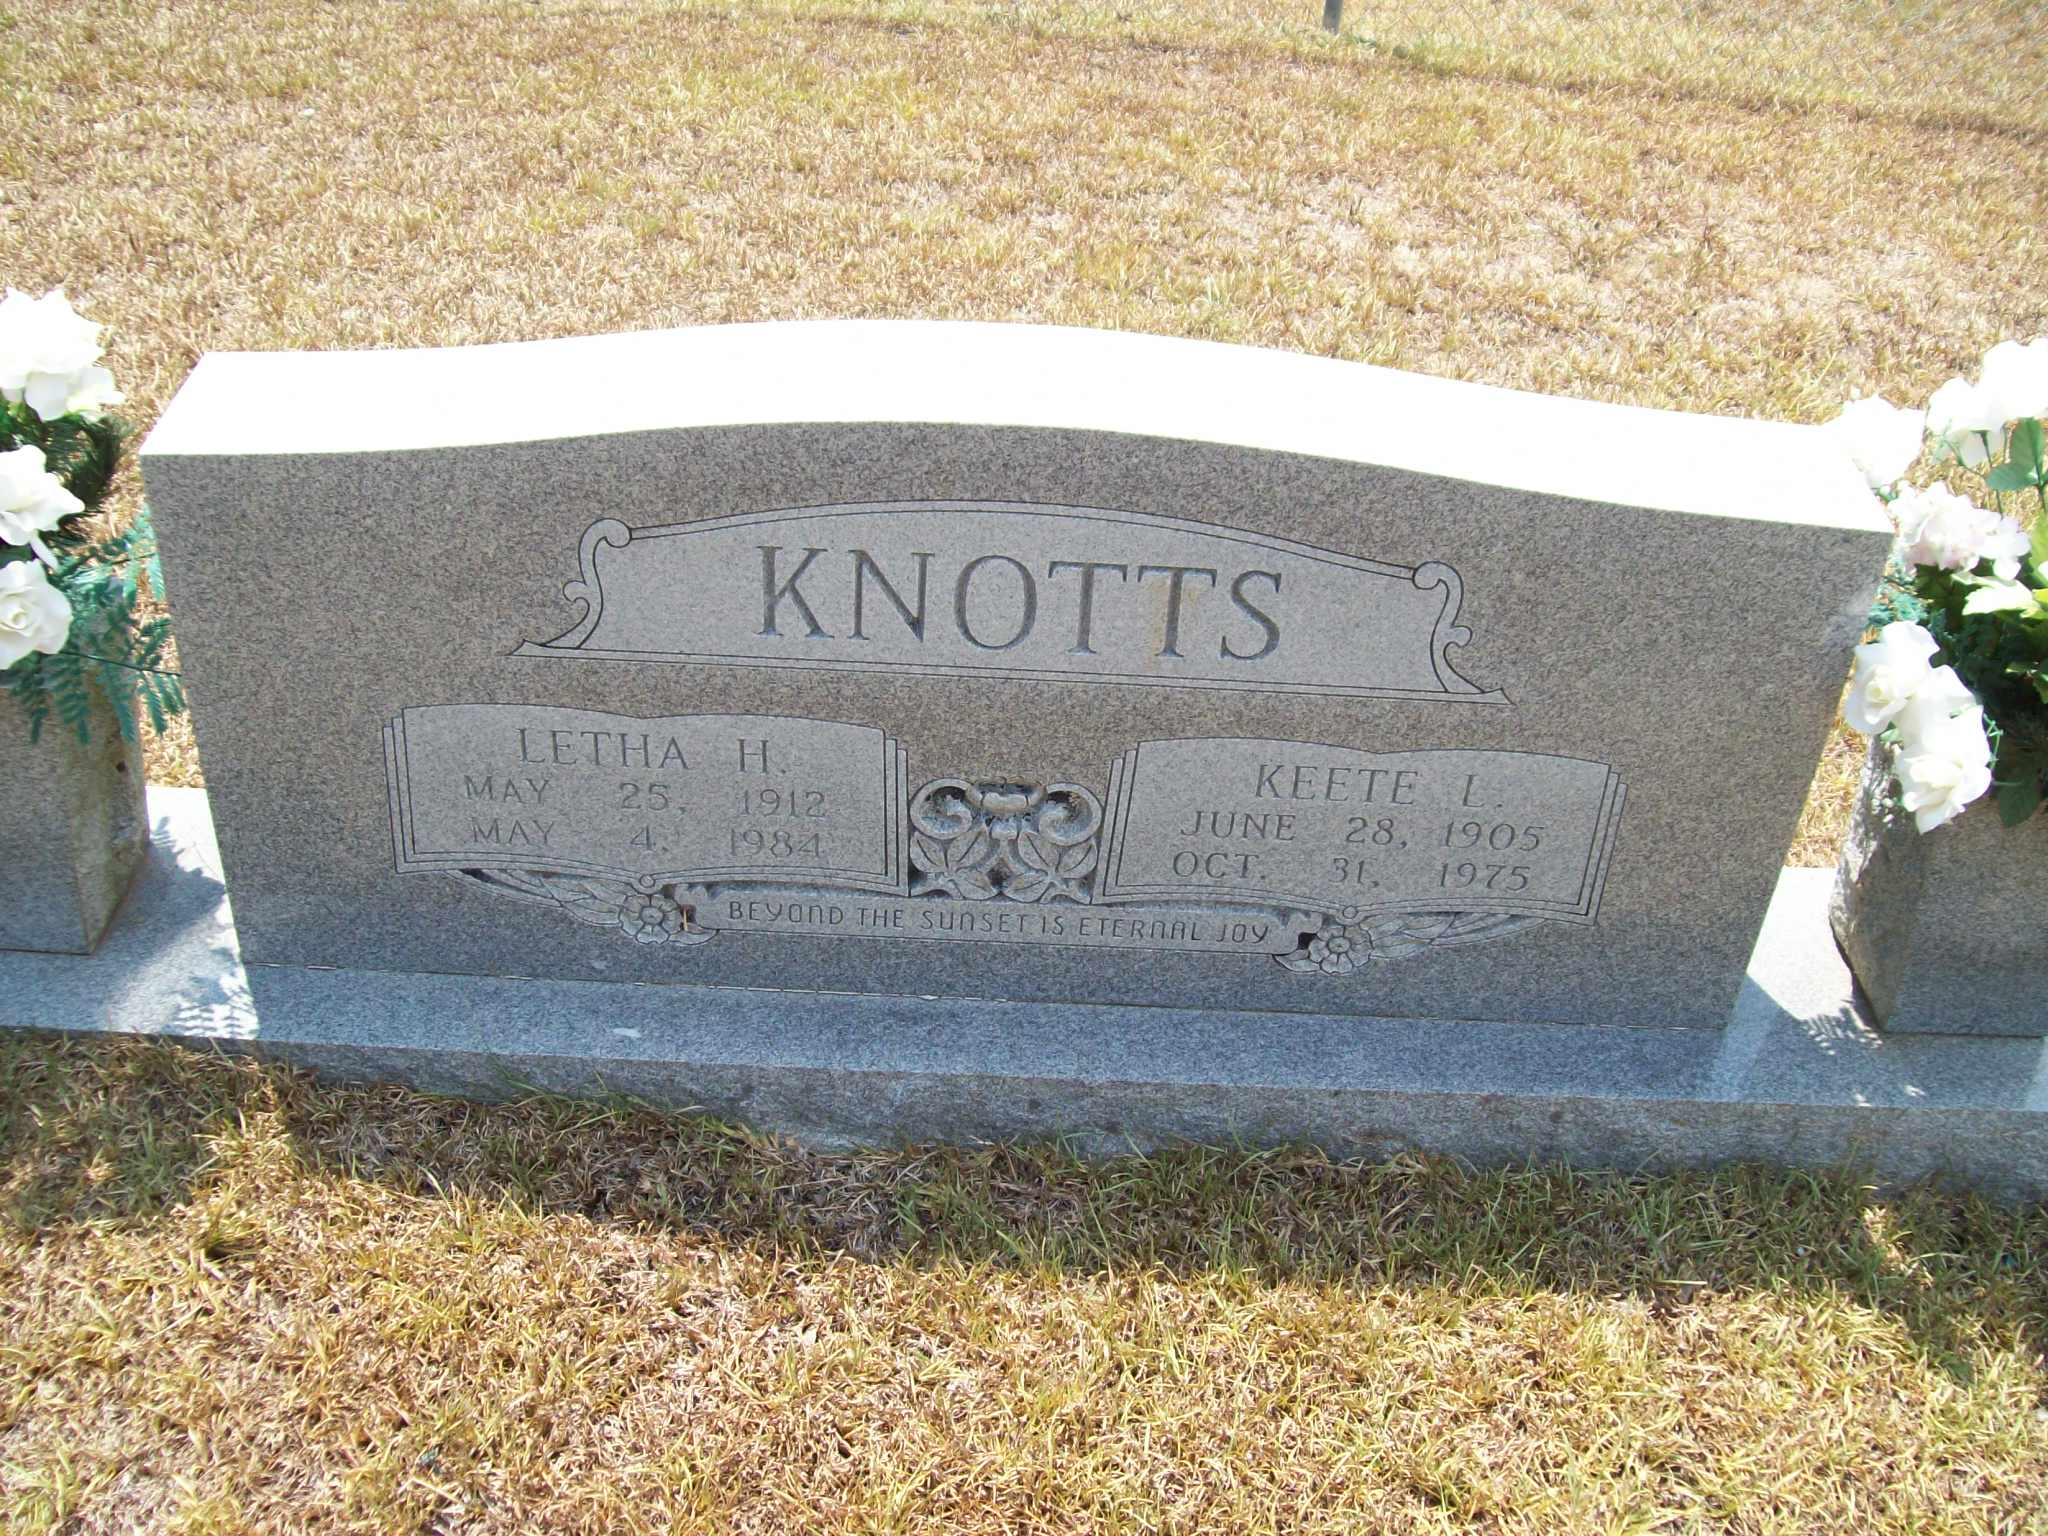 Keete Lloyd Knotts, Sr